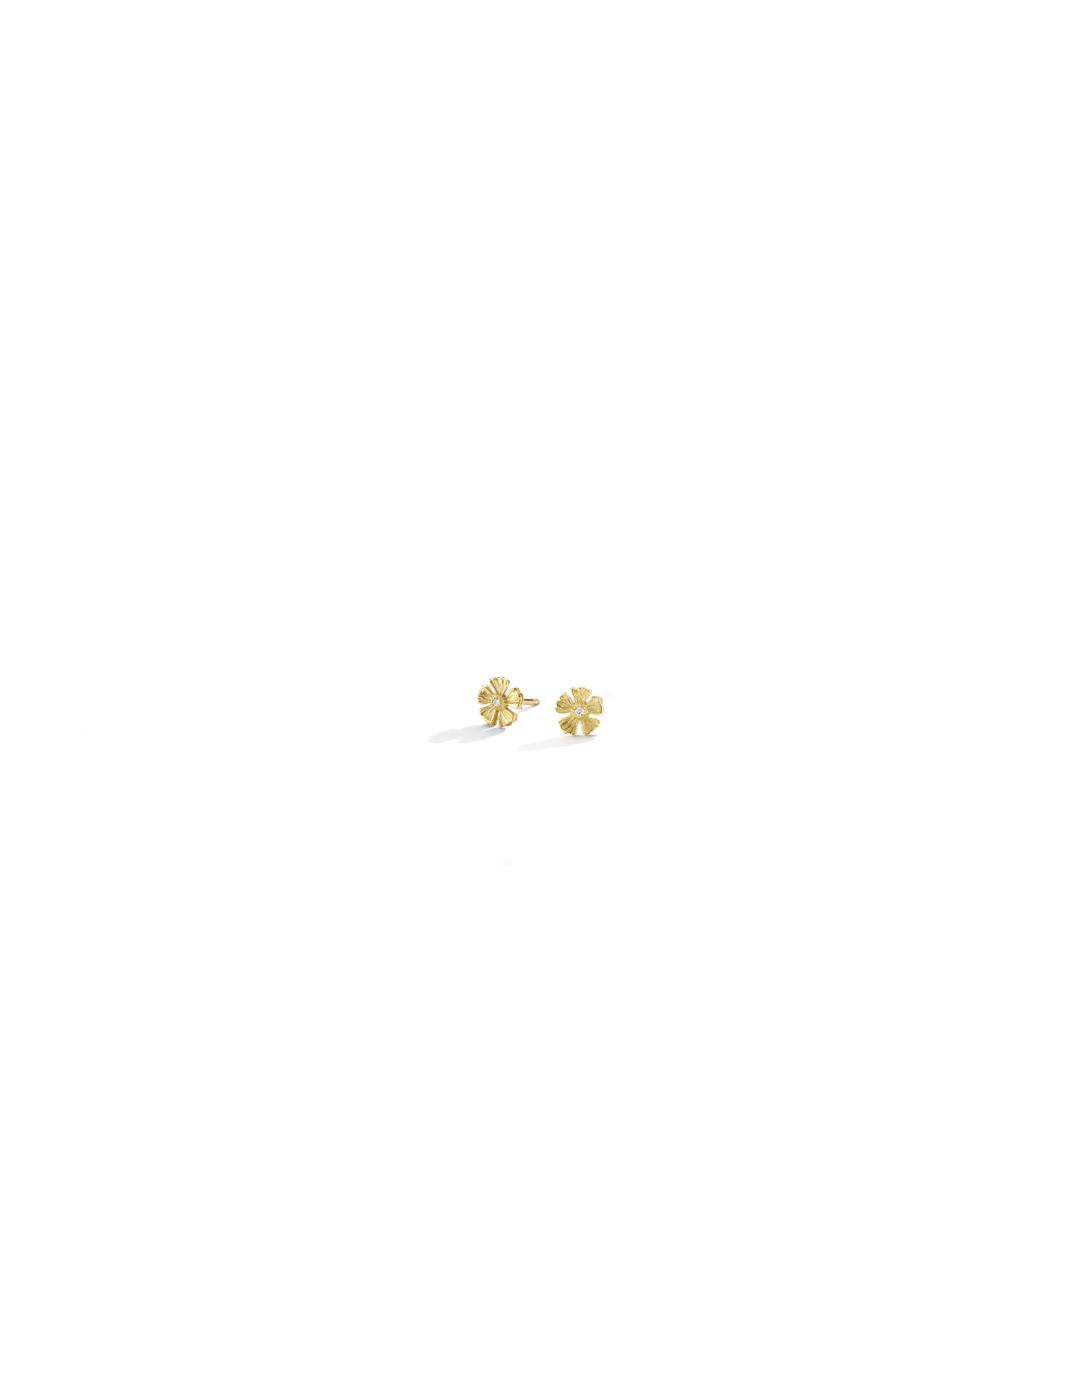 mish_products_earrings_StrawFlwr-Tiny Diam-Stud-ER-1